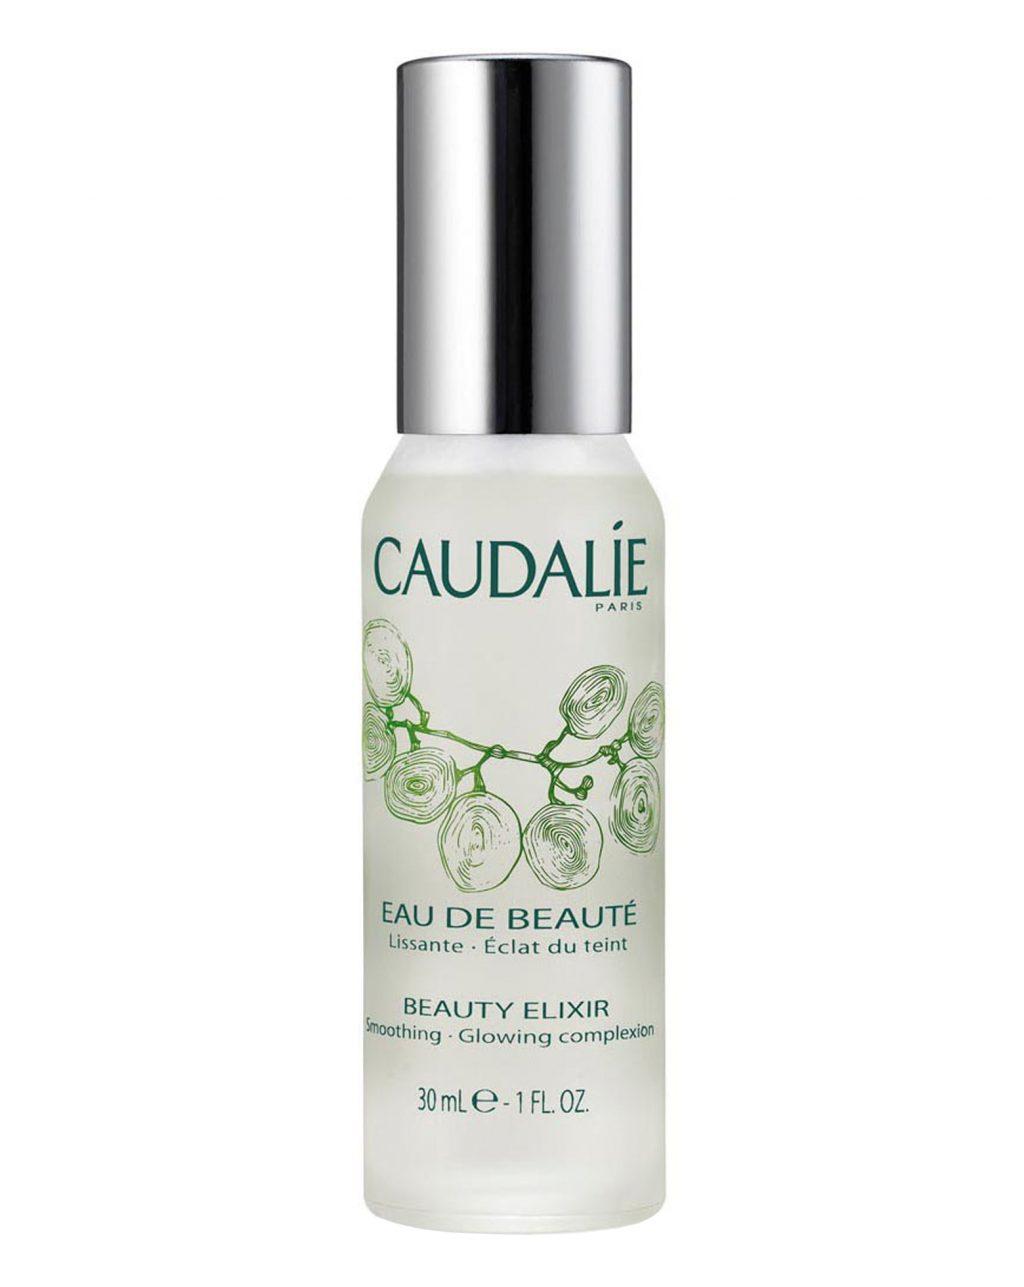 mỹ phẩm Pháp Beauty elixir Caudalie